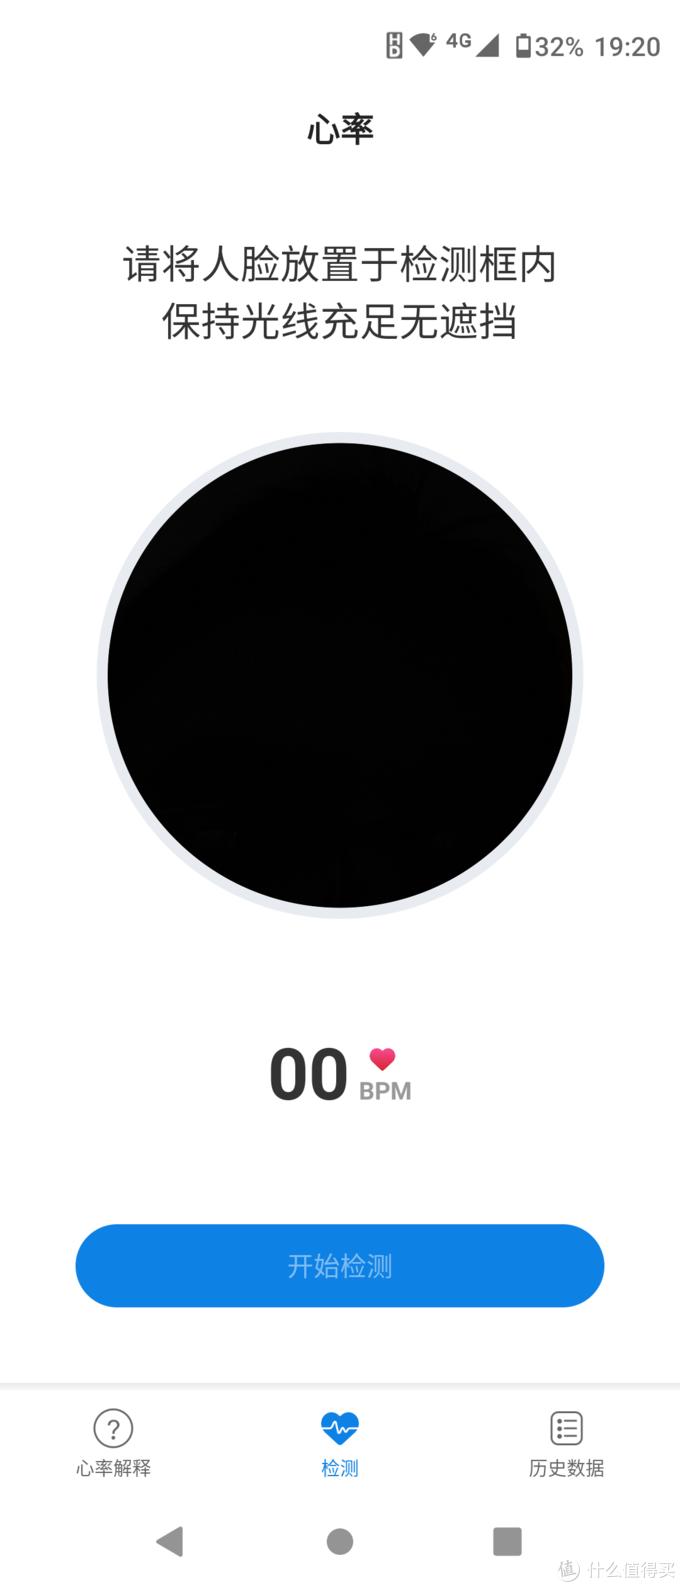 Moto Edge S初体验——俩千块钱交的朋友到底值不值